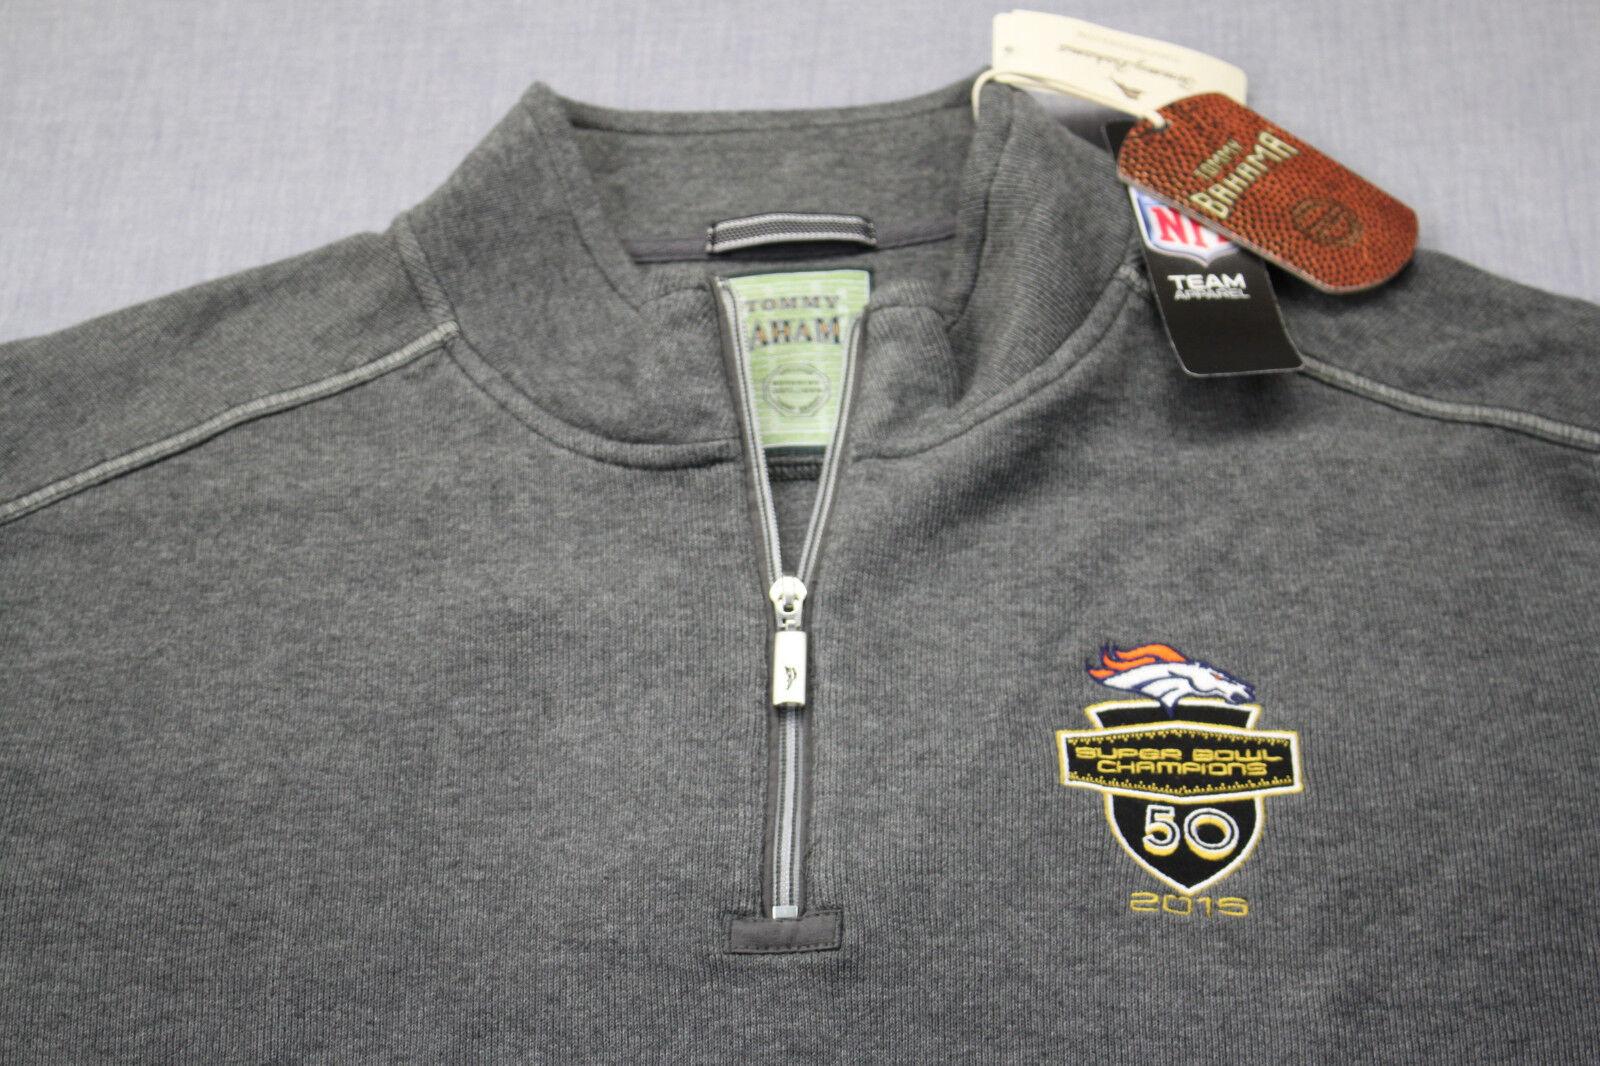 Tommy Bahama NFL Denver Broncos Super Bowl grau 1/4 Zip Sweatshirt NWT 2XL 158